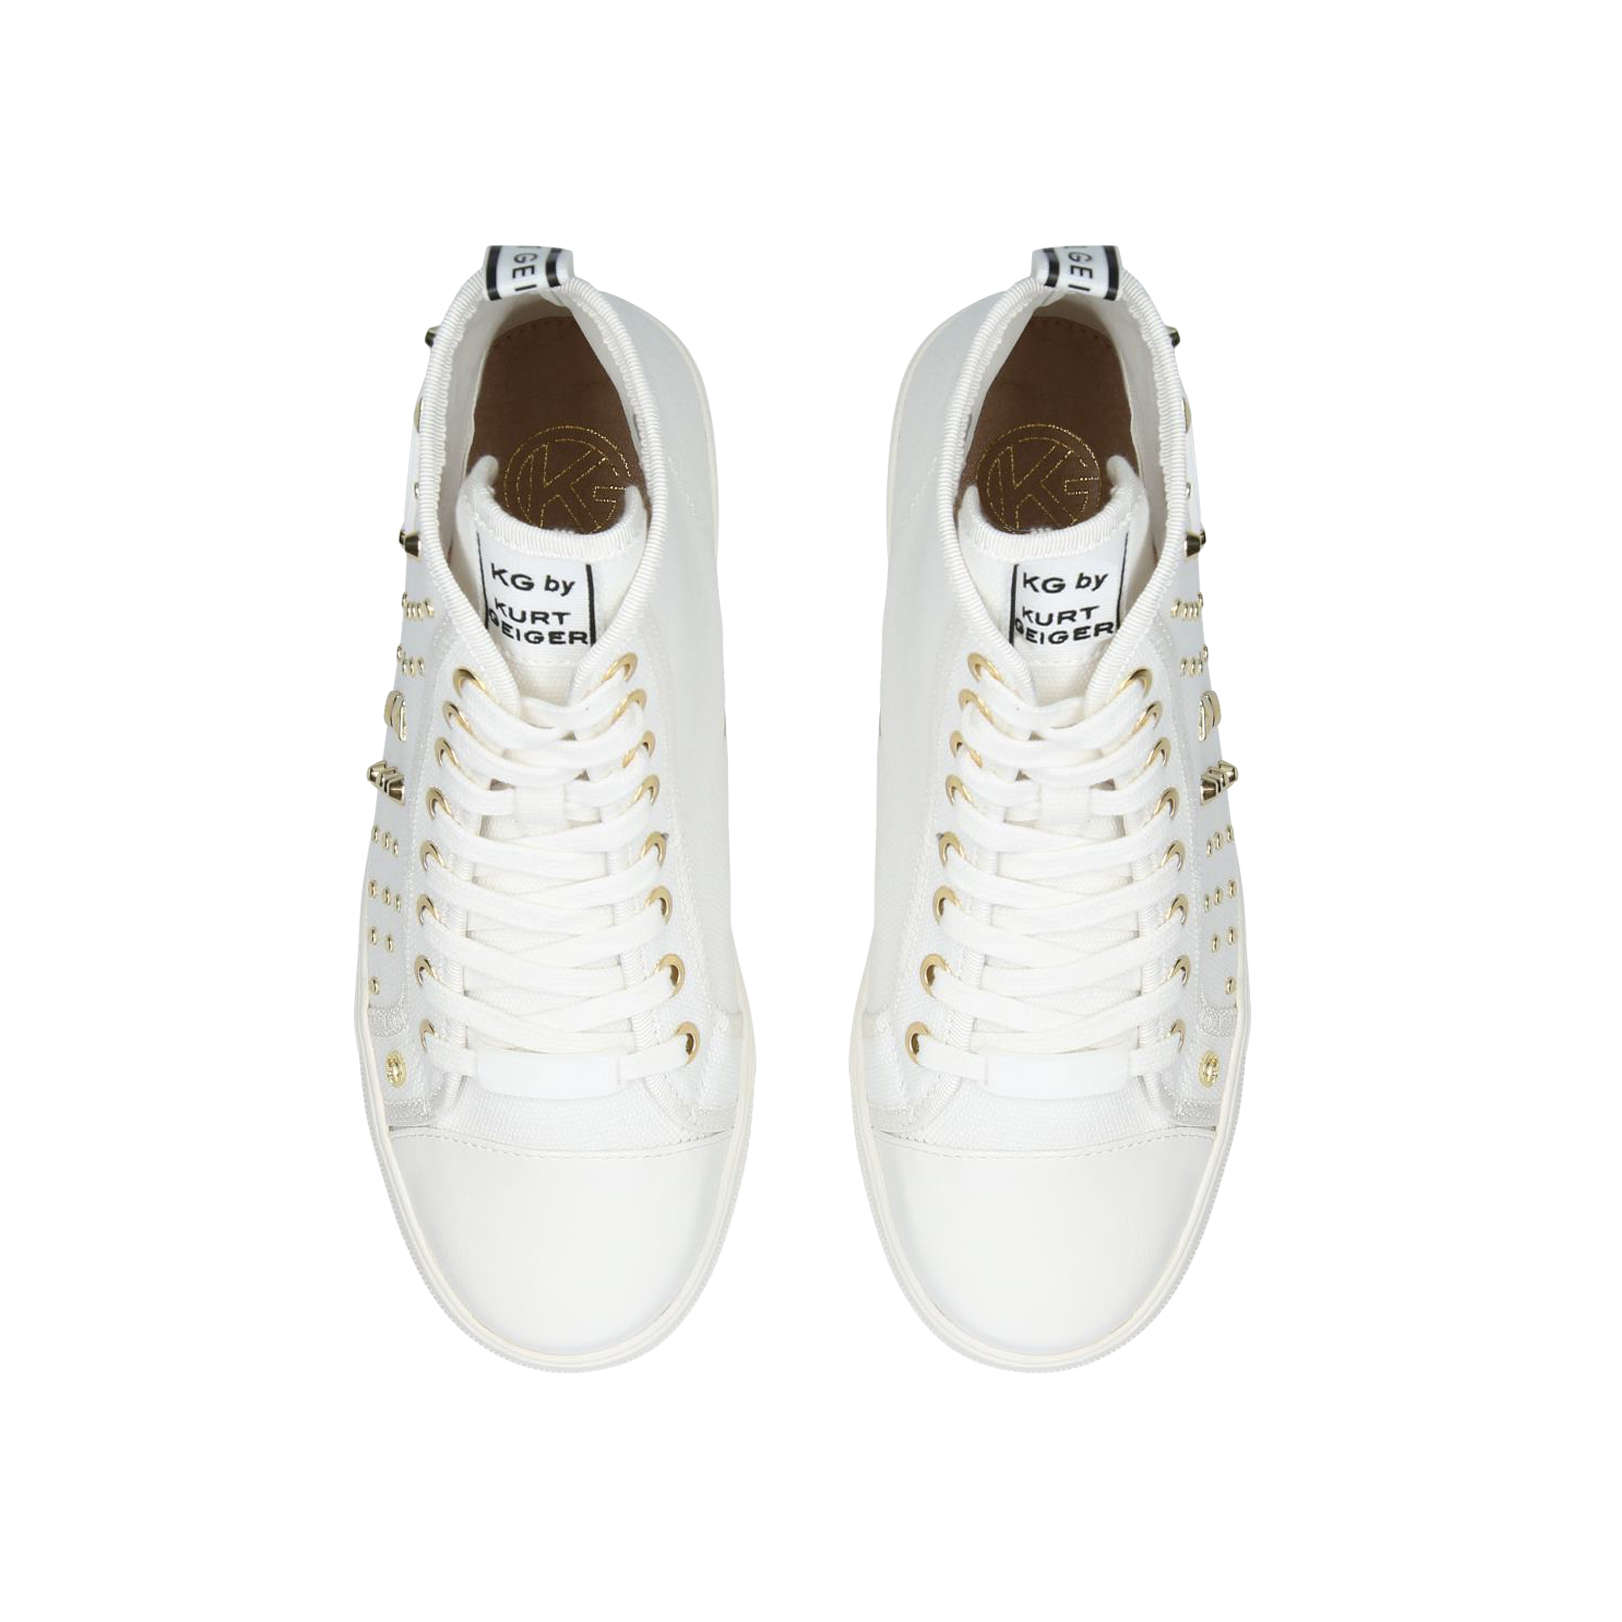 LILY - KG KURT GEIGER Sneakers